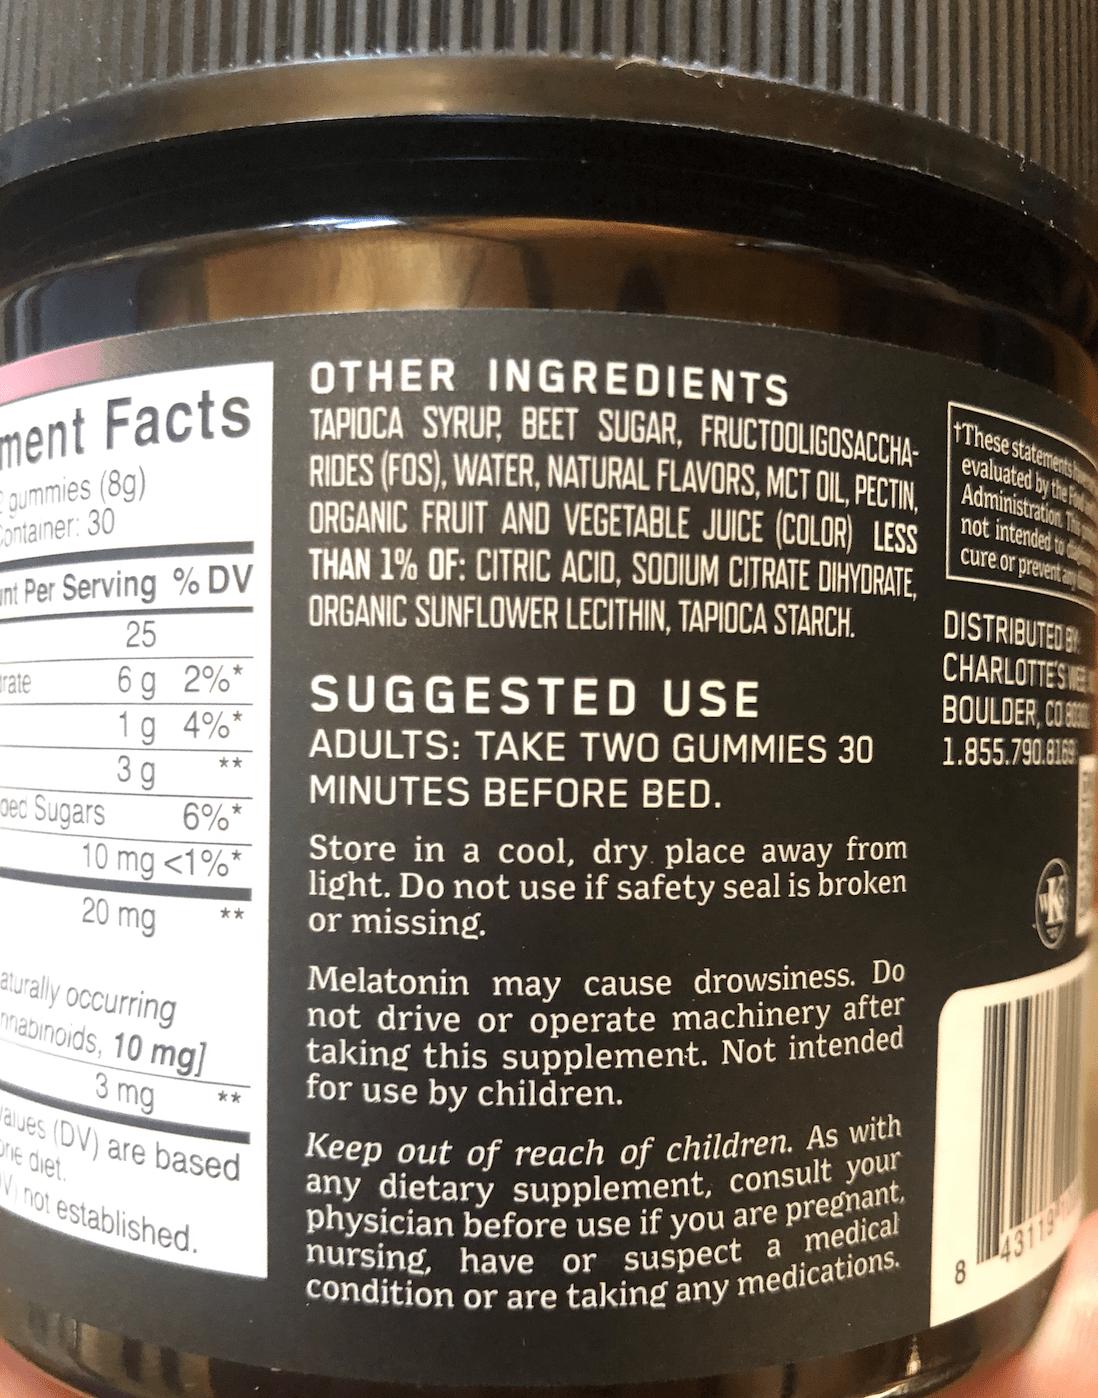 Charlottes Web Ingredients List